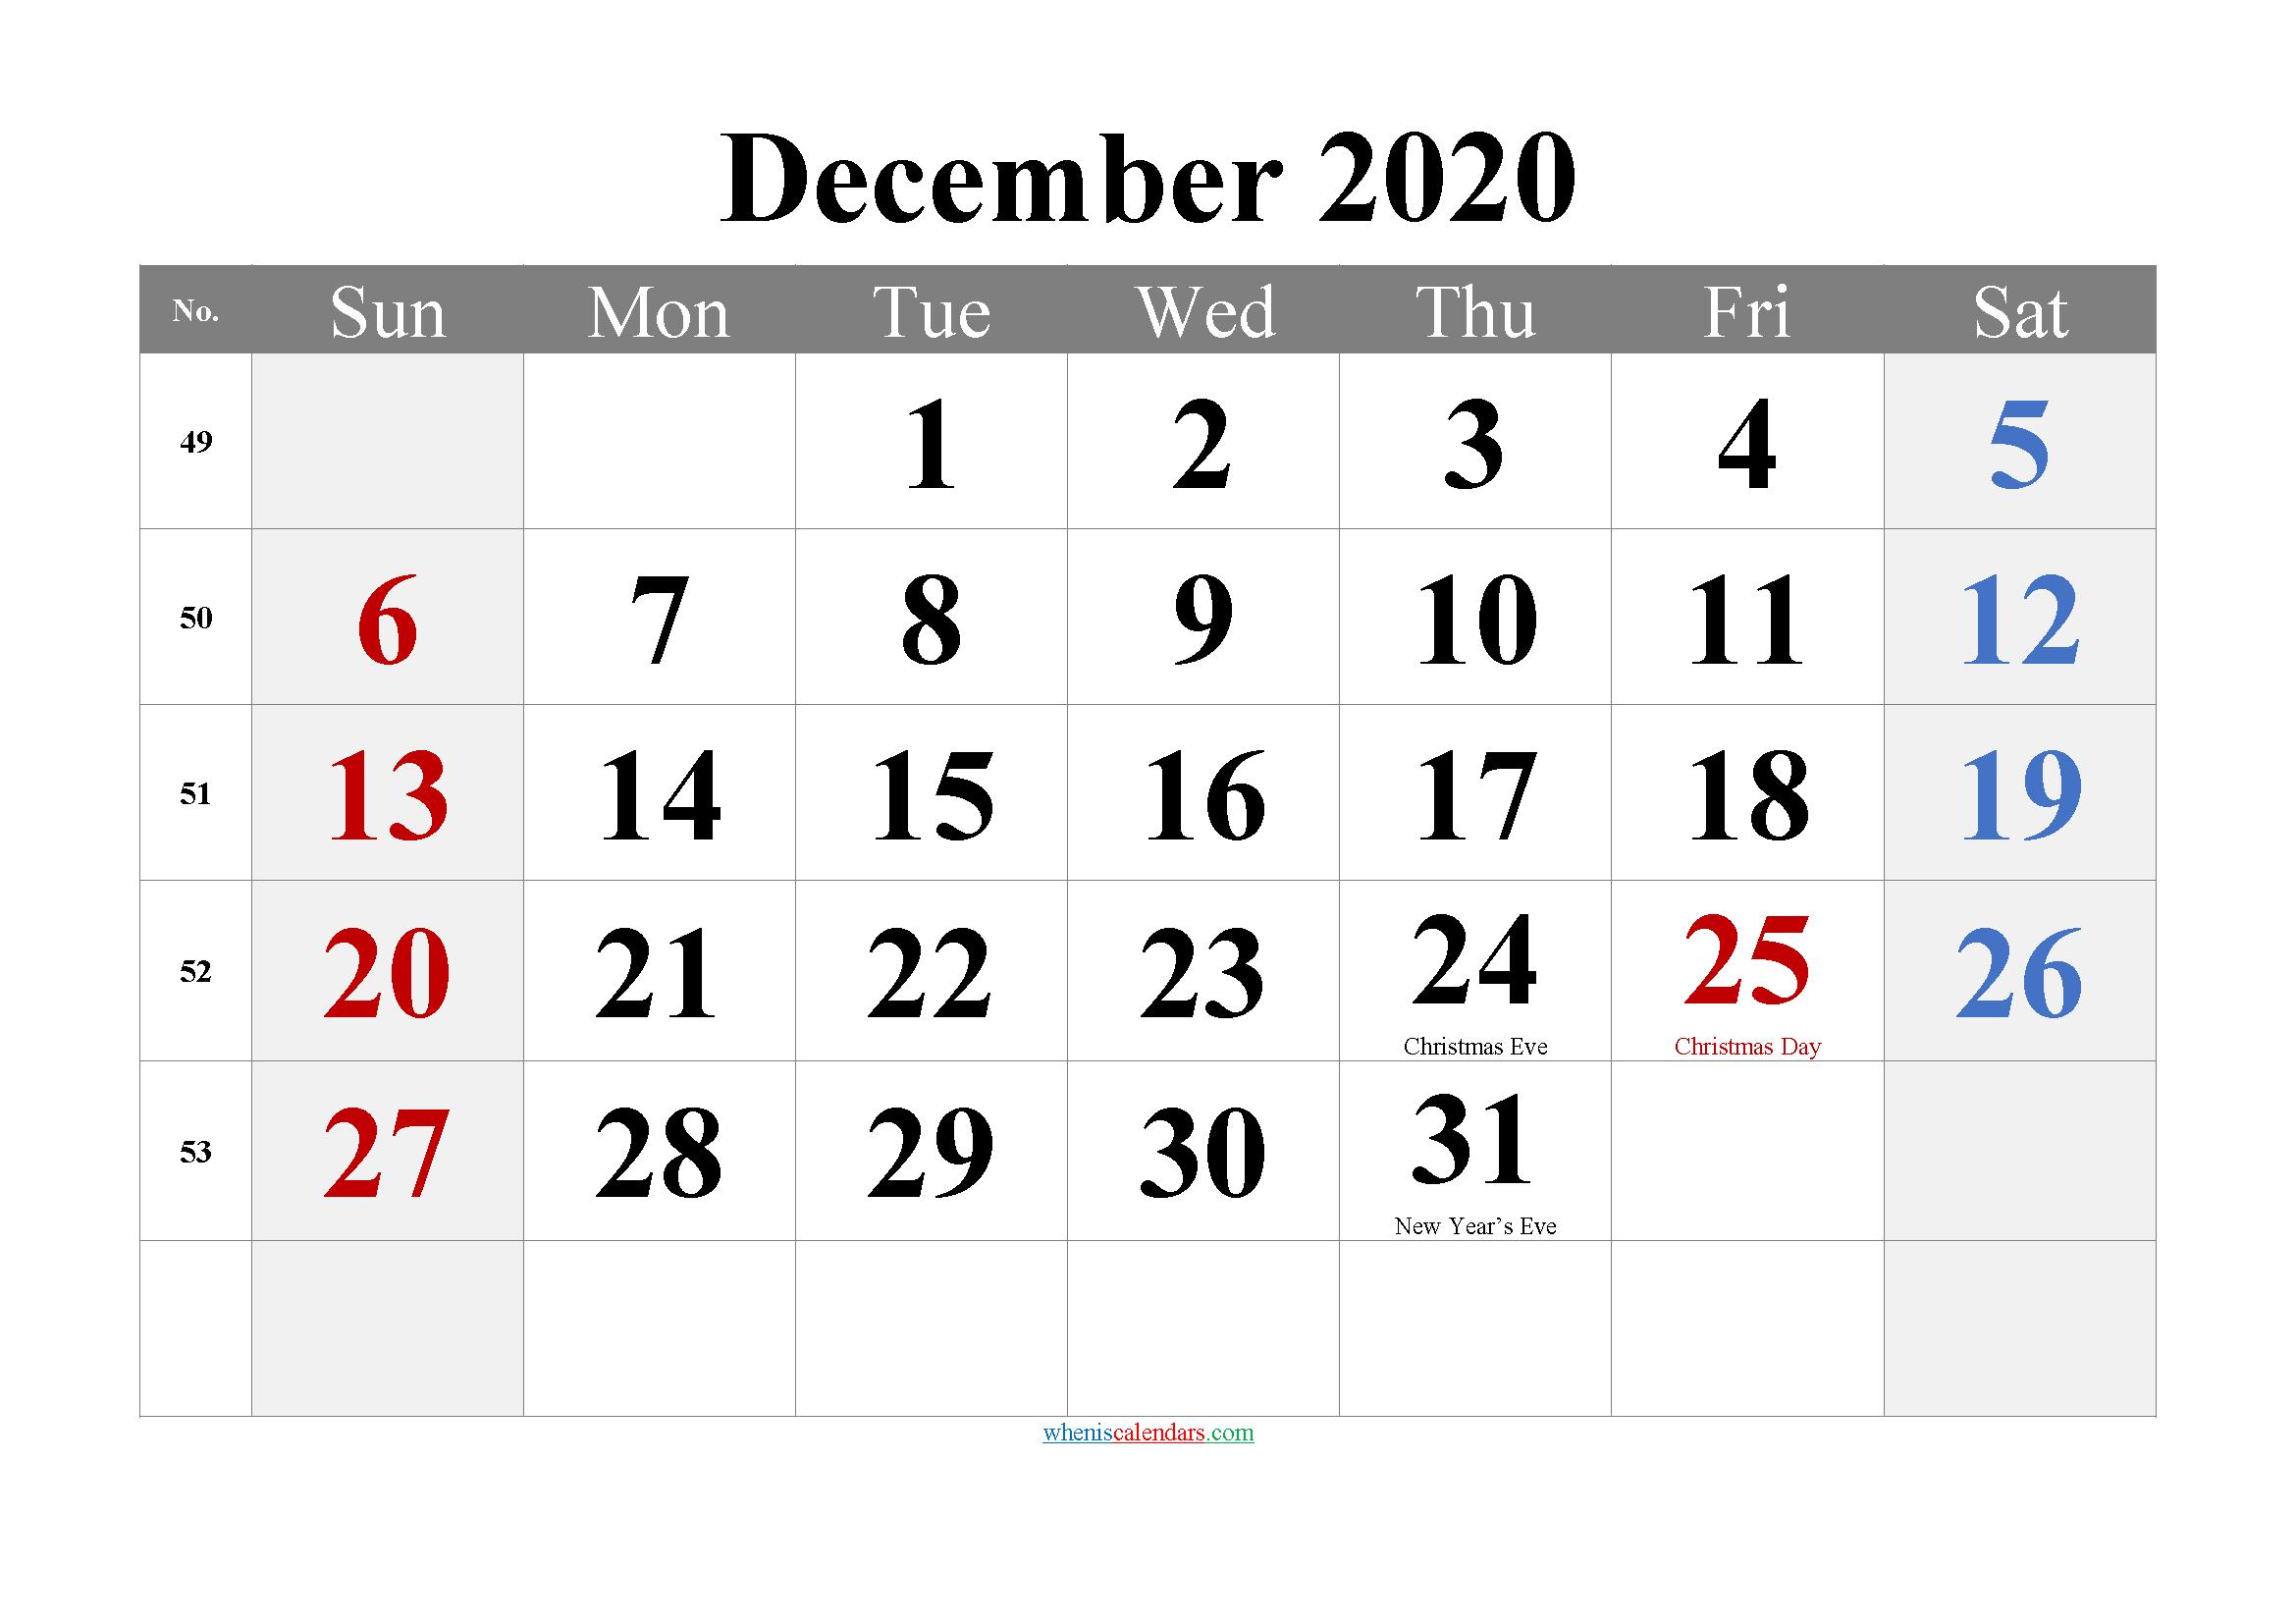 December 2020 Printable Calendar with Holidays